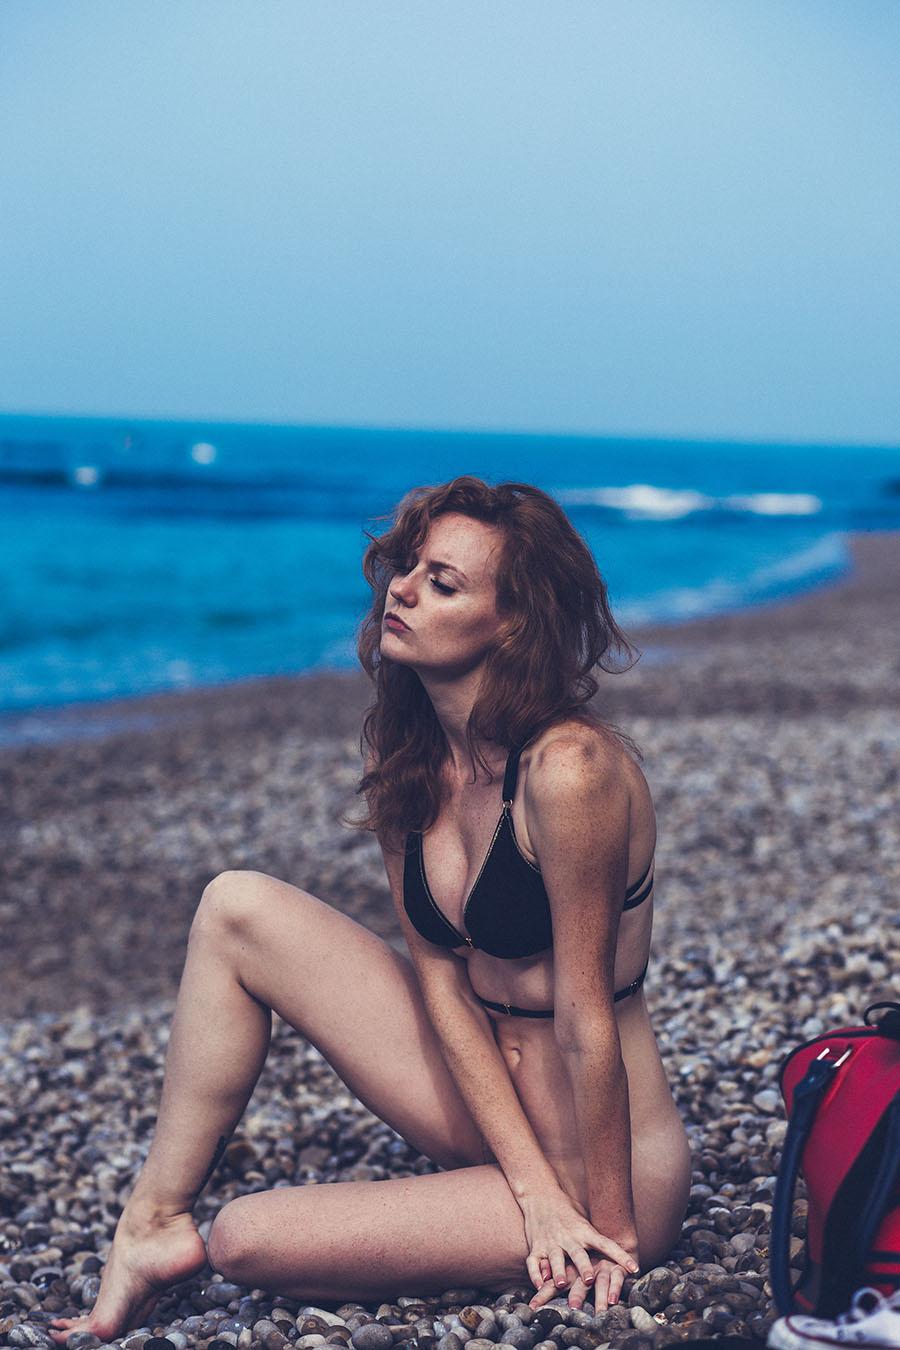 Paparazzi Feet Lauren Maltby  nudes (53 fotos), YouTube, panties